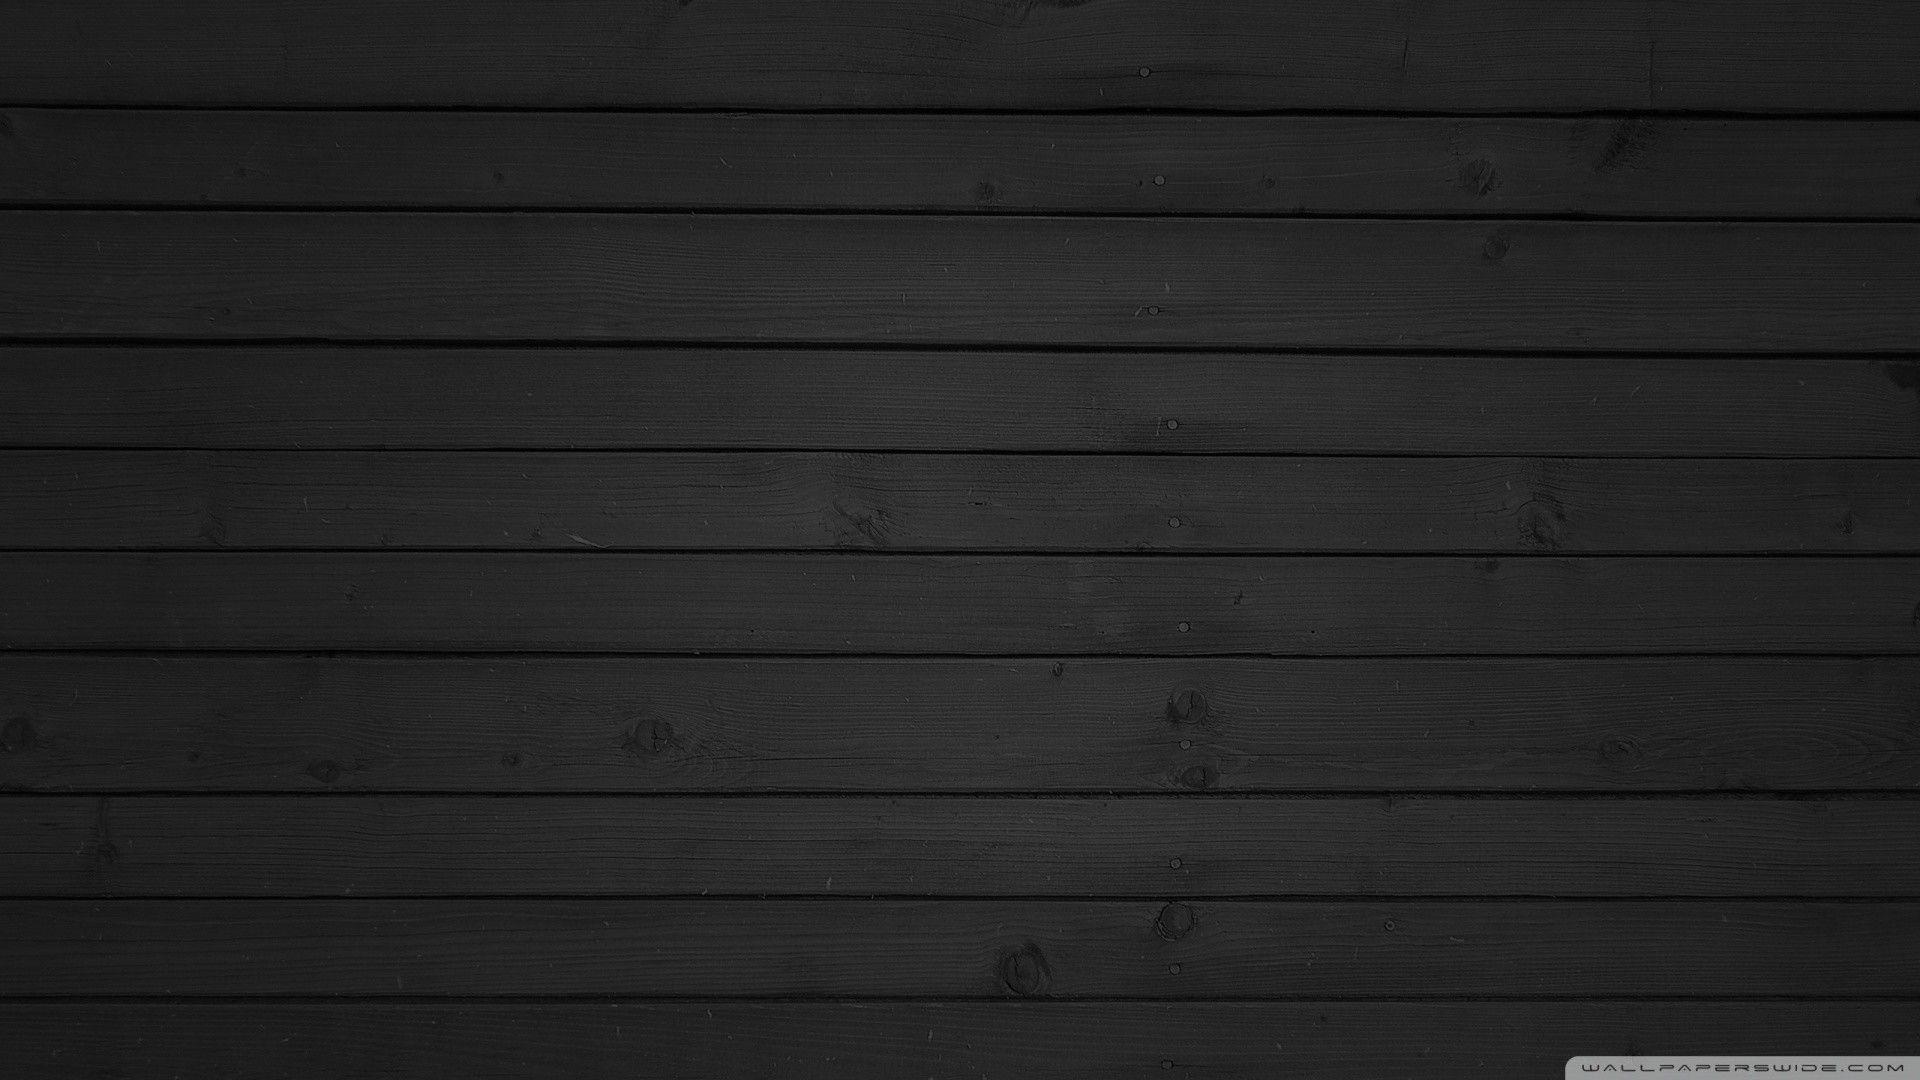 79 1080p Black Wallpapers On Wallpaperplay Wood Wallpaper Dark Wallpaper Dark Wood Wallpaper